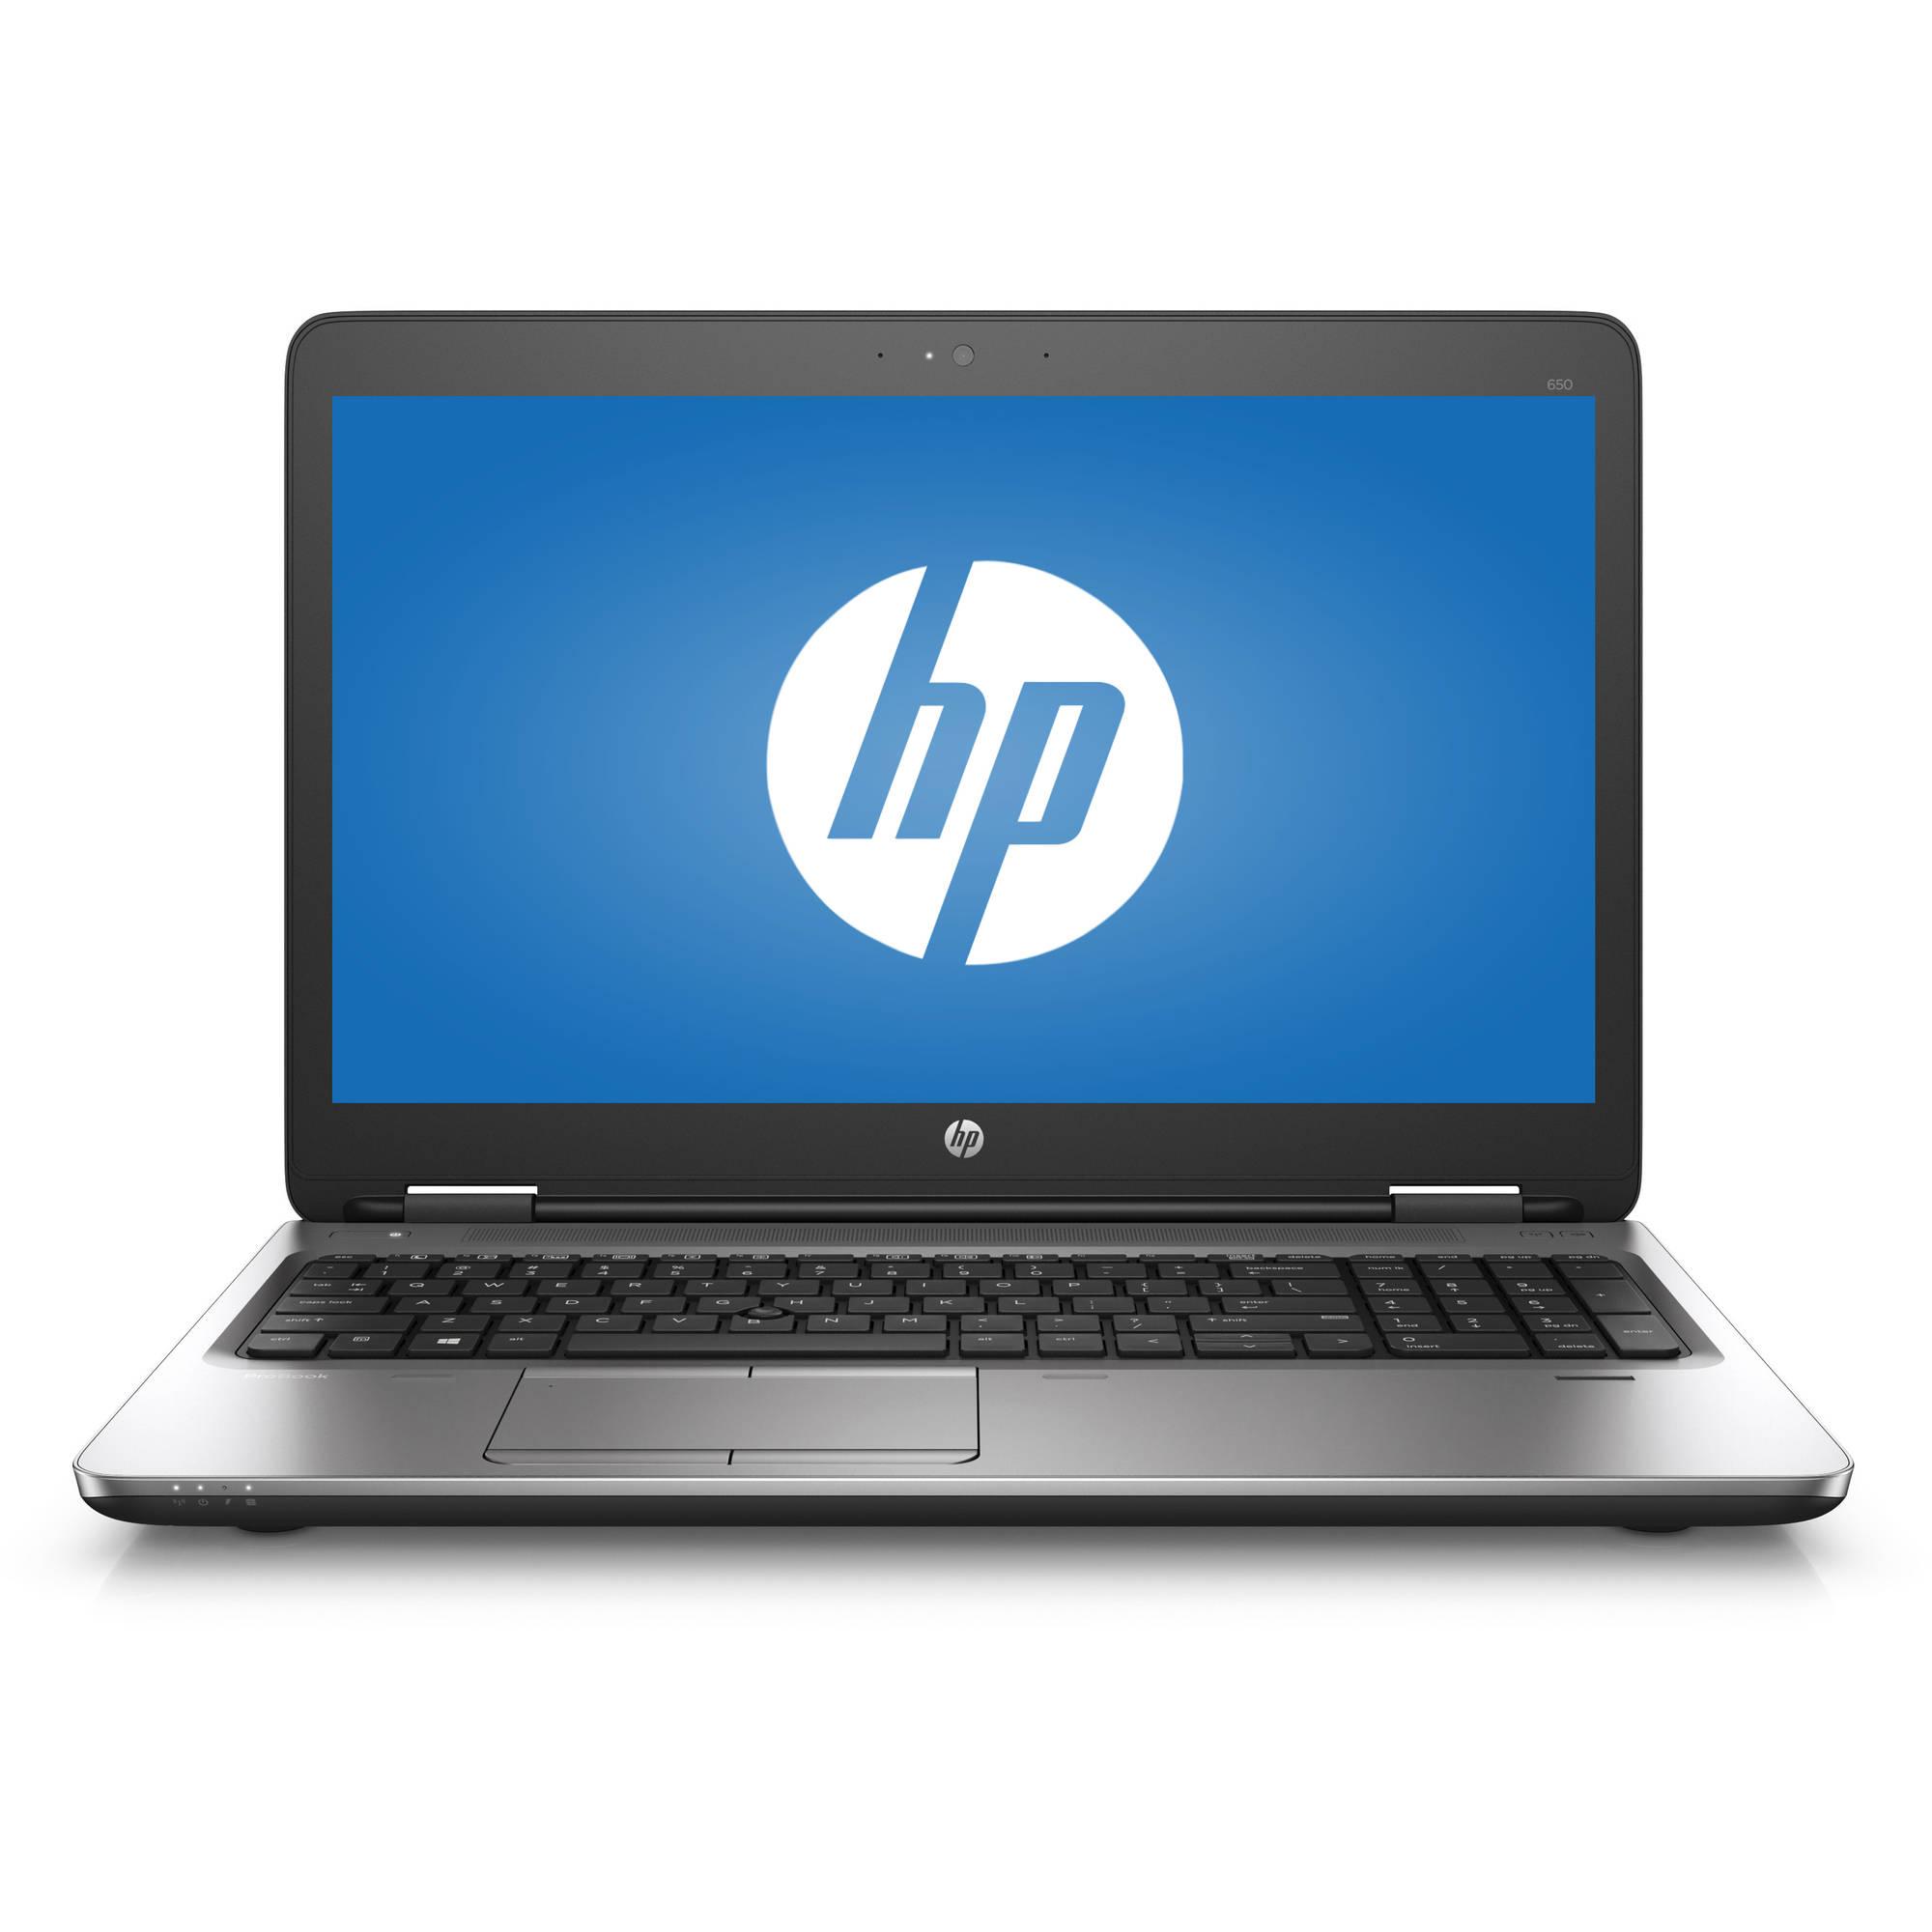 "HP ProBook 650 G2 V1P80UT#ABA 15.6"" Laptop, Windows 7 Professional, Intel Core i7-6600U Dual-Core Processor, 8GB RAM, 256GB Hard Drive"